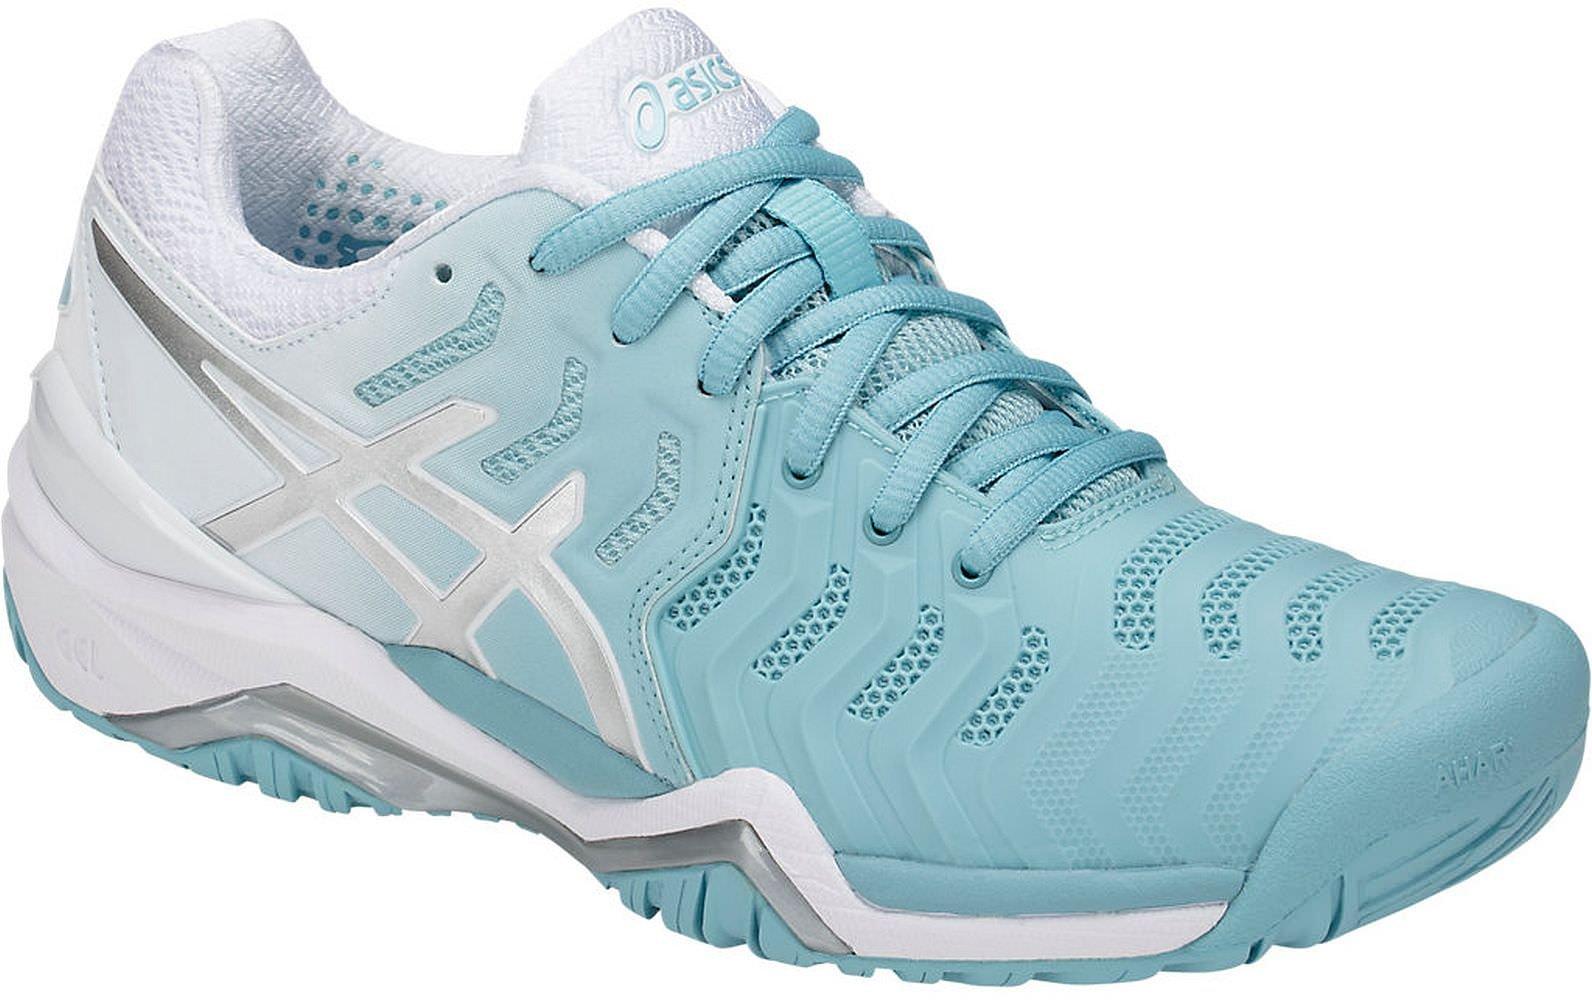 Asics Women's Gel-Resolution 7 Tennis-Shoes, Porcelain Blue/Silver/White (7.5 Medium US)